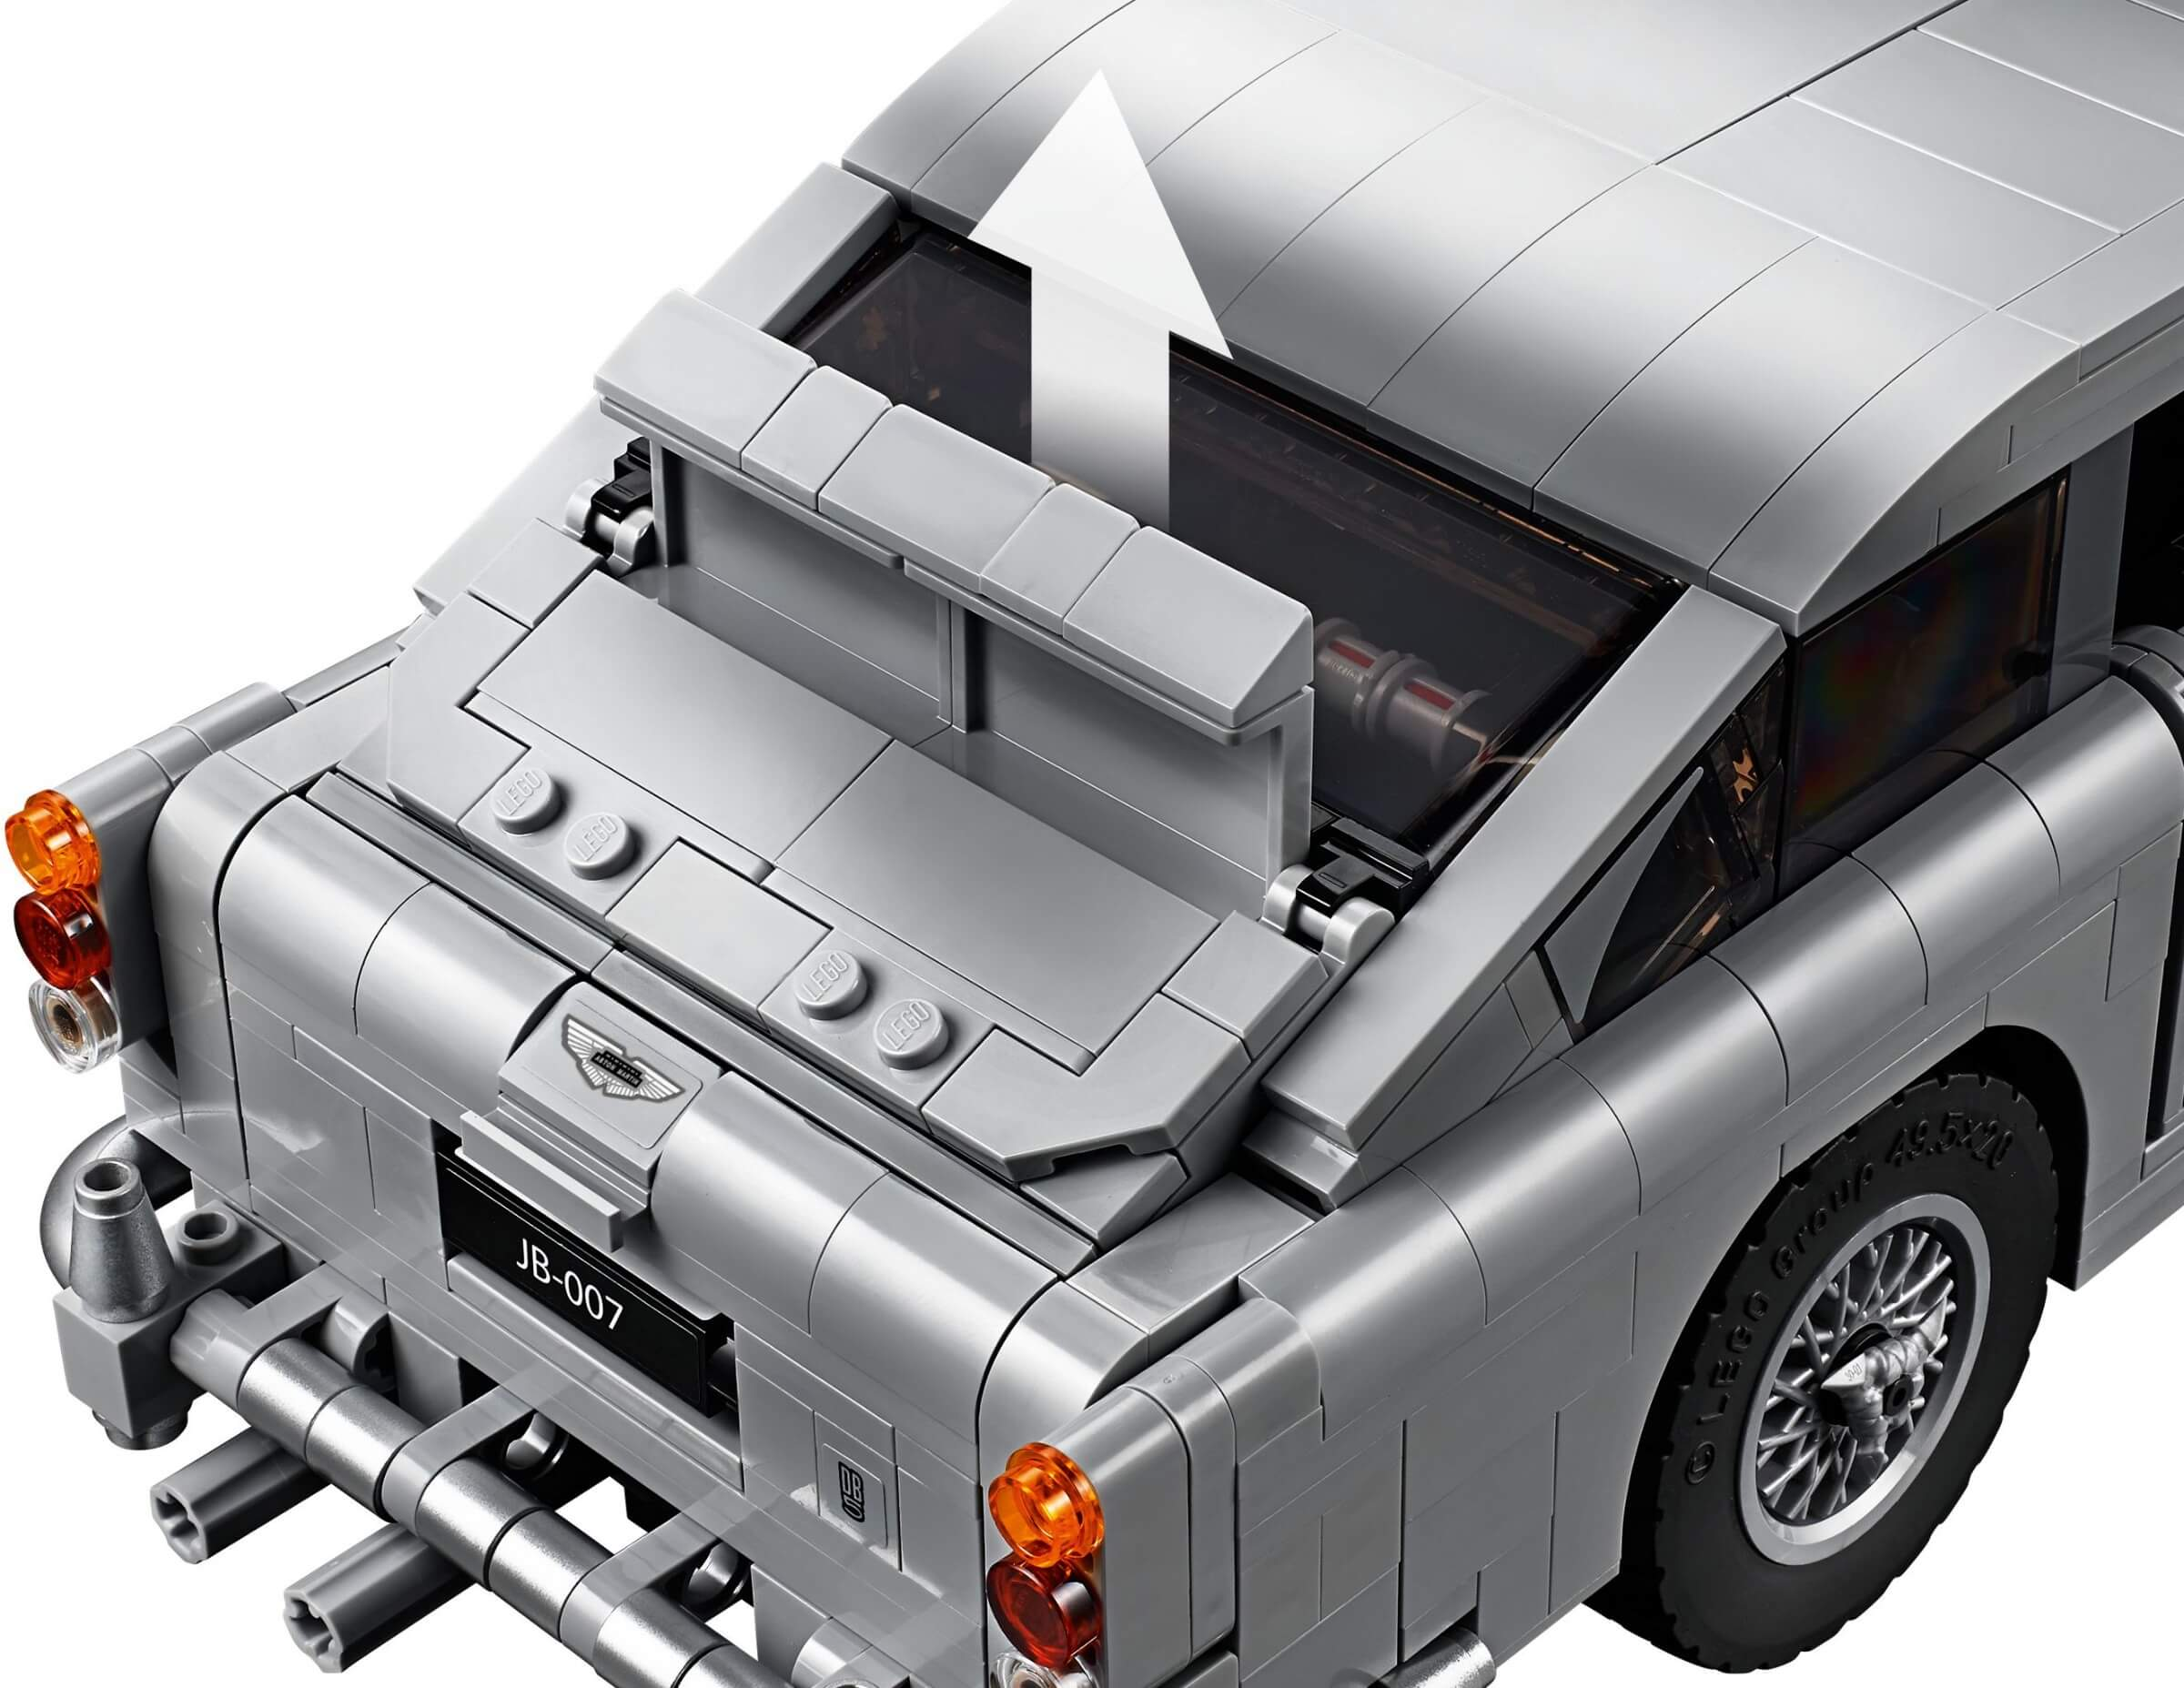 Mua đồ chơi LEGO 10262 - LEGO Creator Expert 10262 - Siêu Xe Aston Martin DB5 trong phim James Bond (LEGO 10262 James Bond Aston Martin DB5)